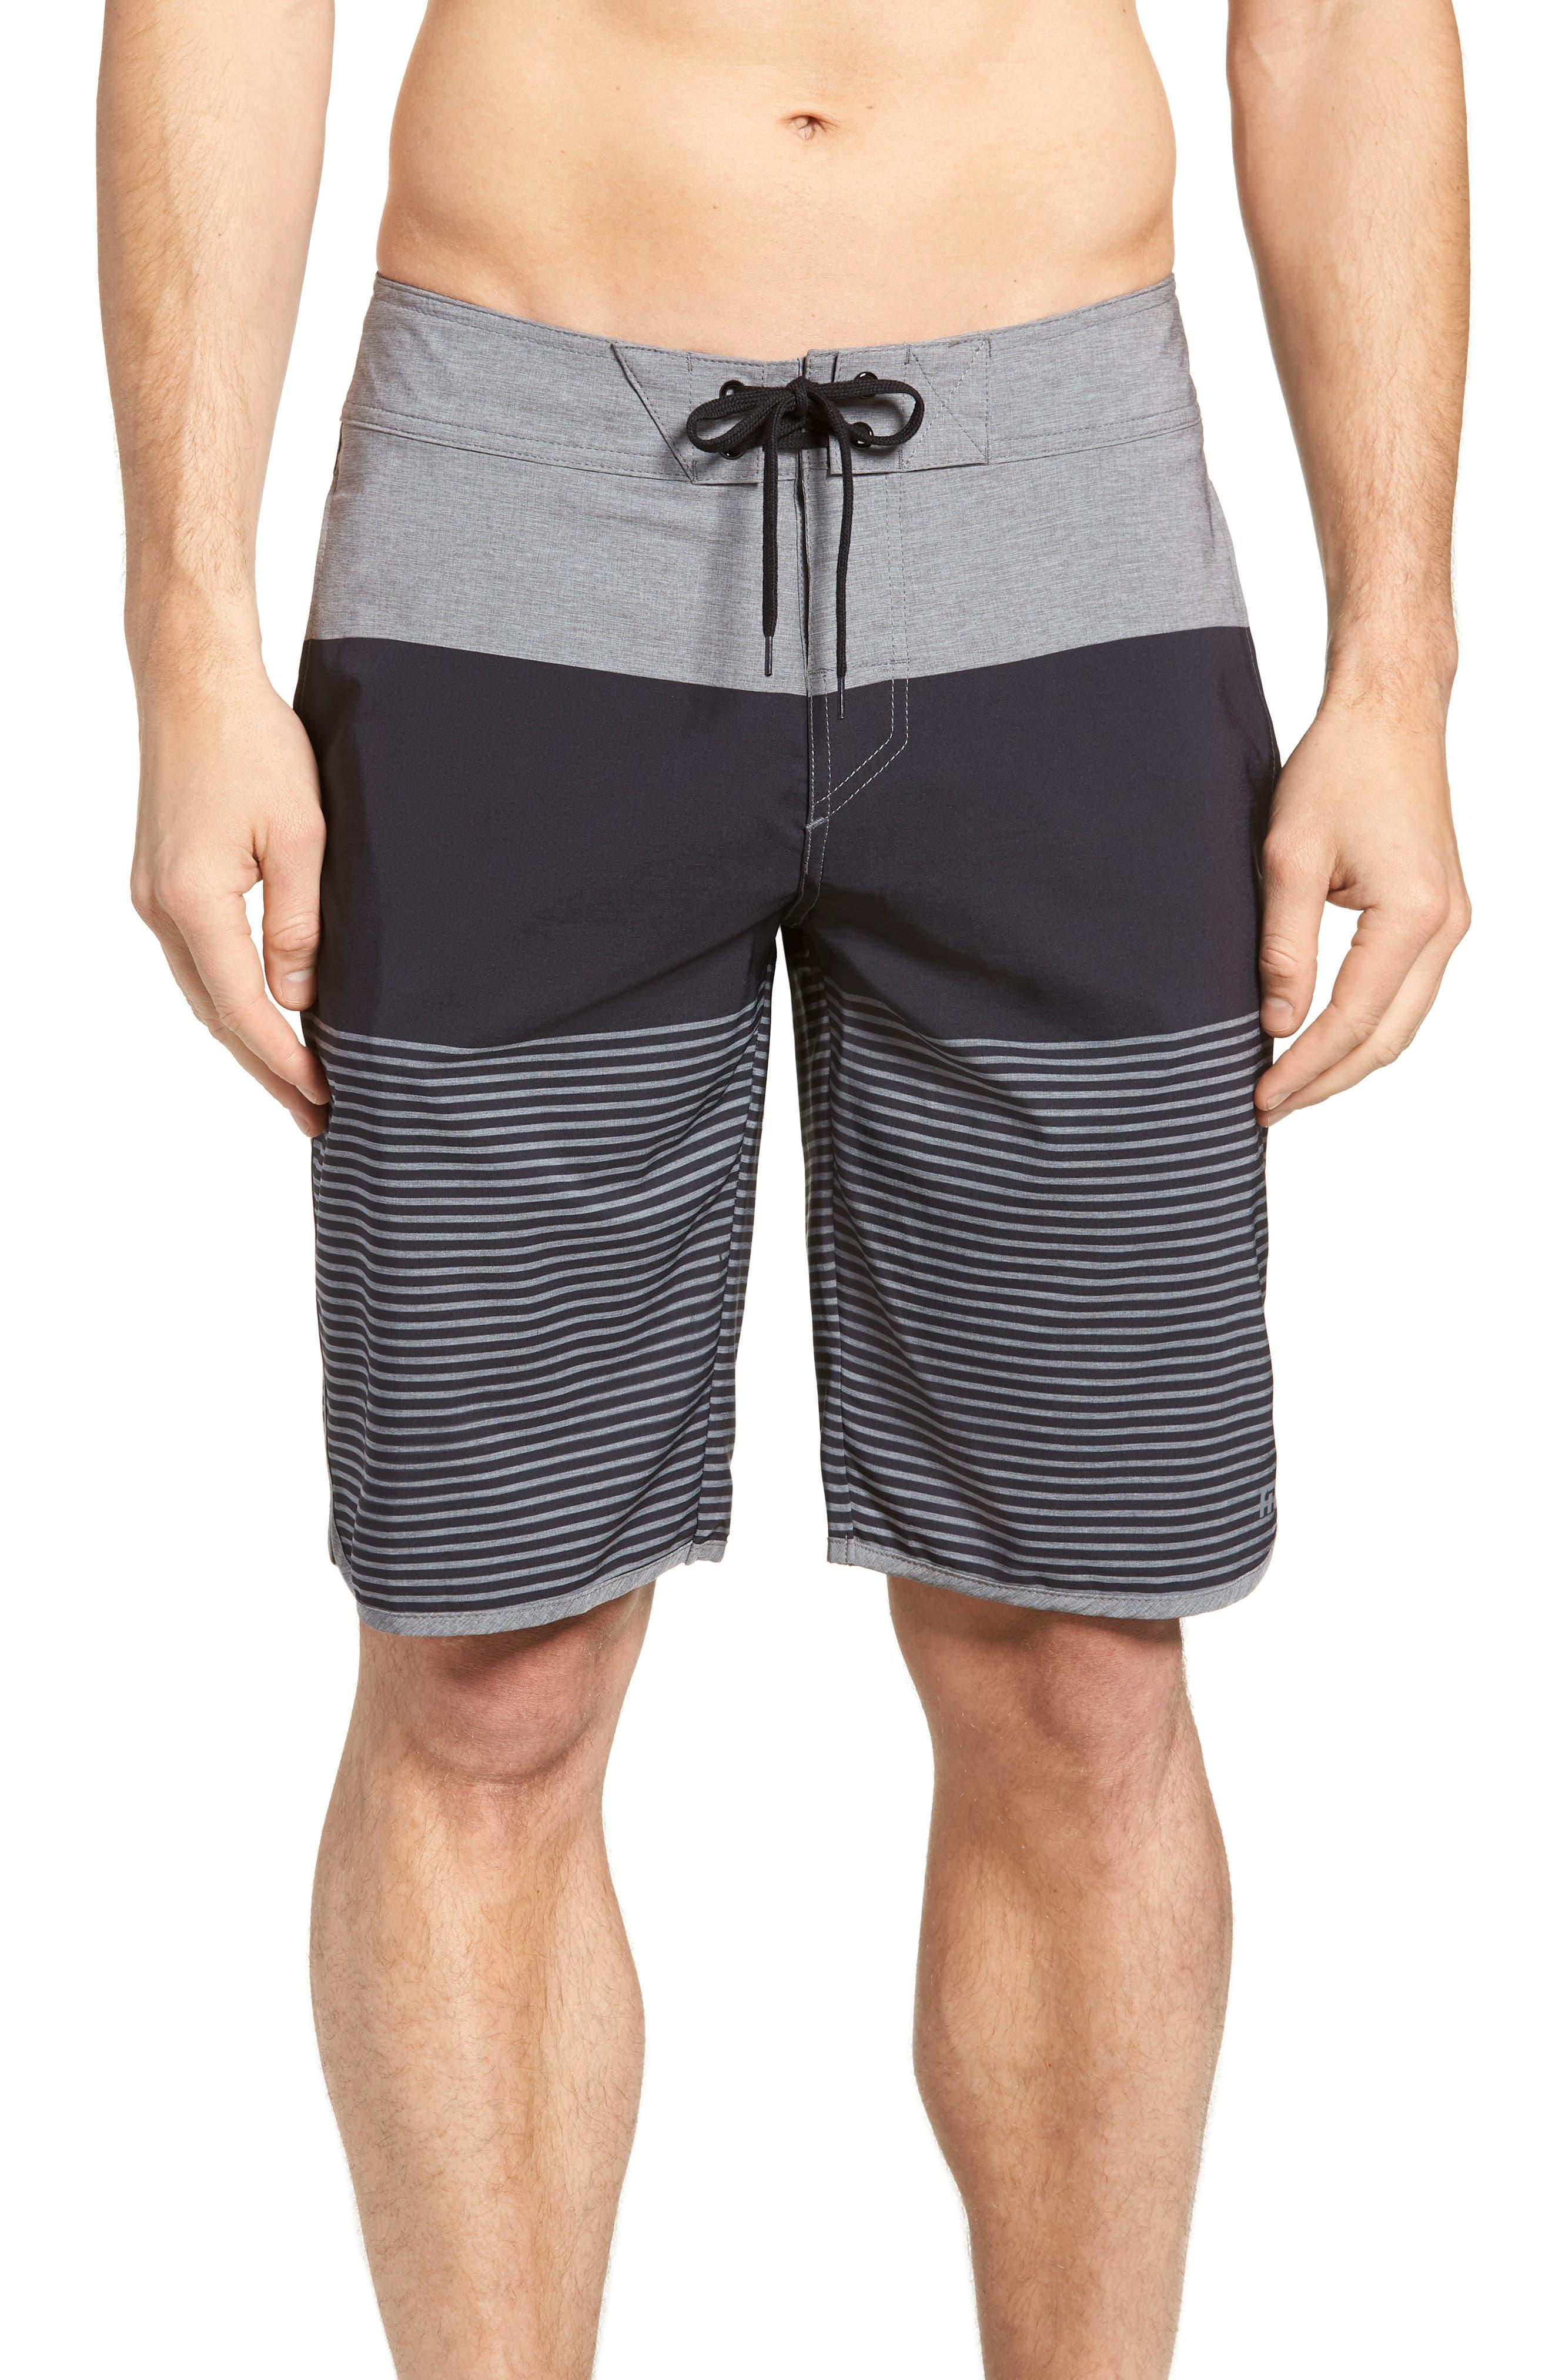 Claim It Regular Fit Board Shorts,                             Main thumbnail 1, color,                             HEATHER BLACK